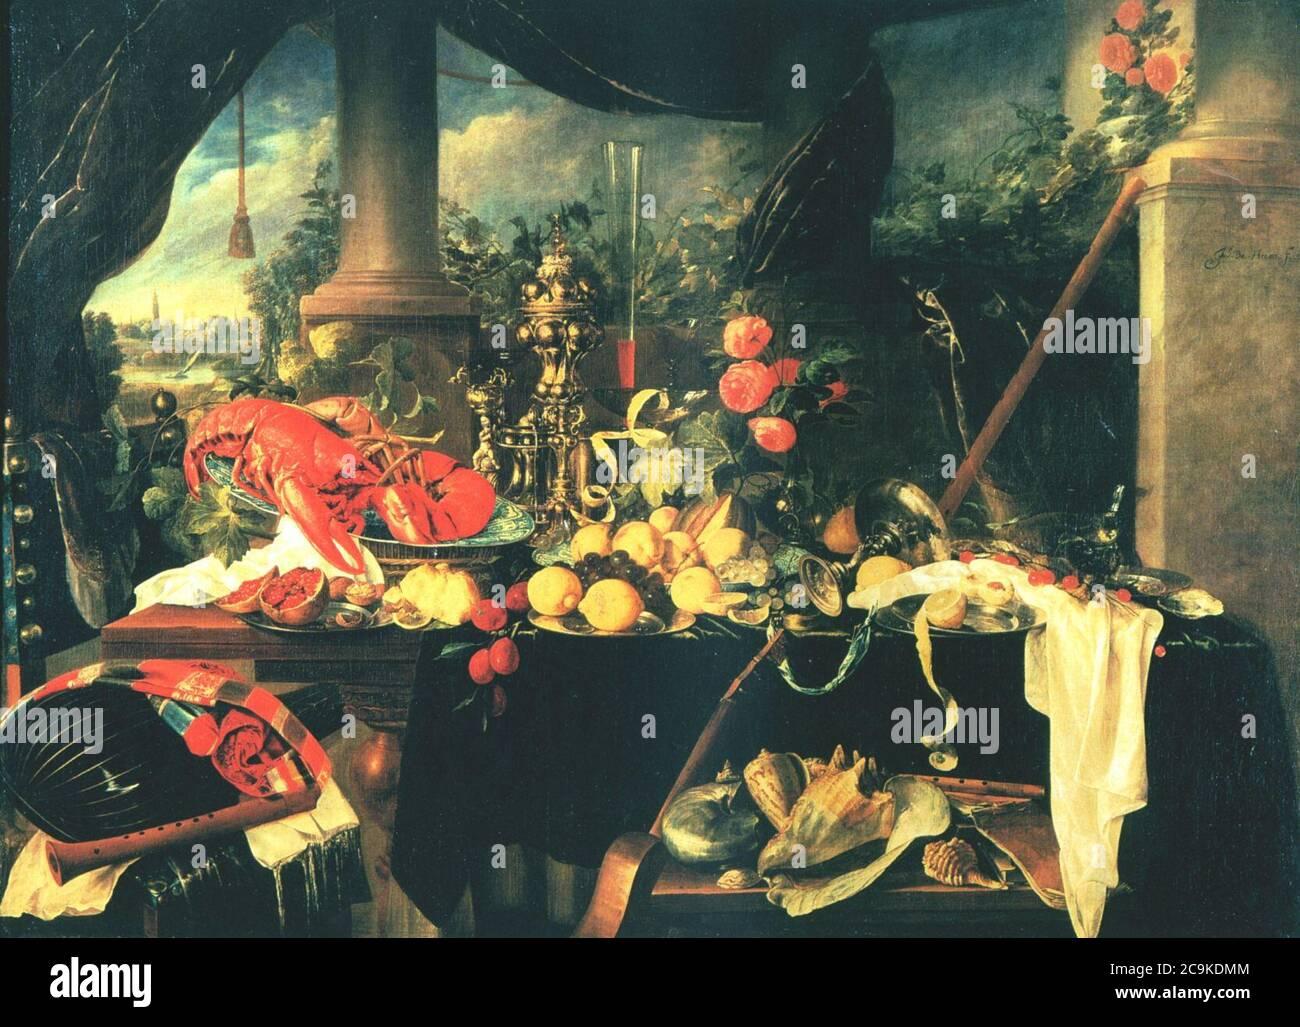 Jan-Davidsz-de-Heem-006. Banque D'Images